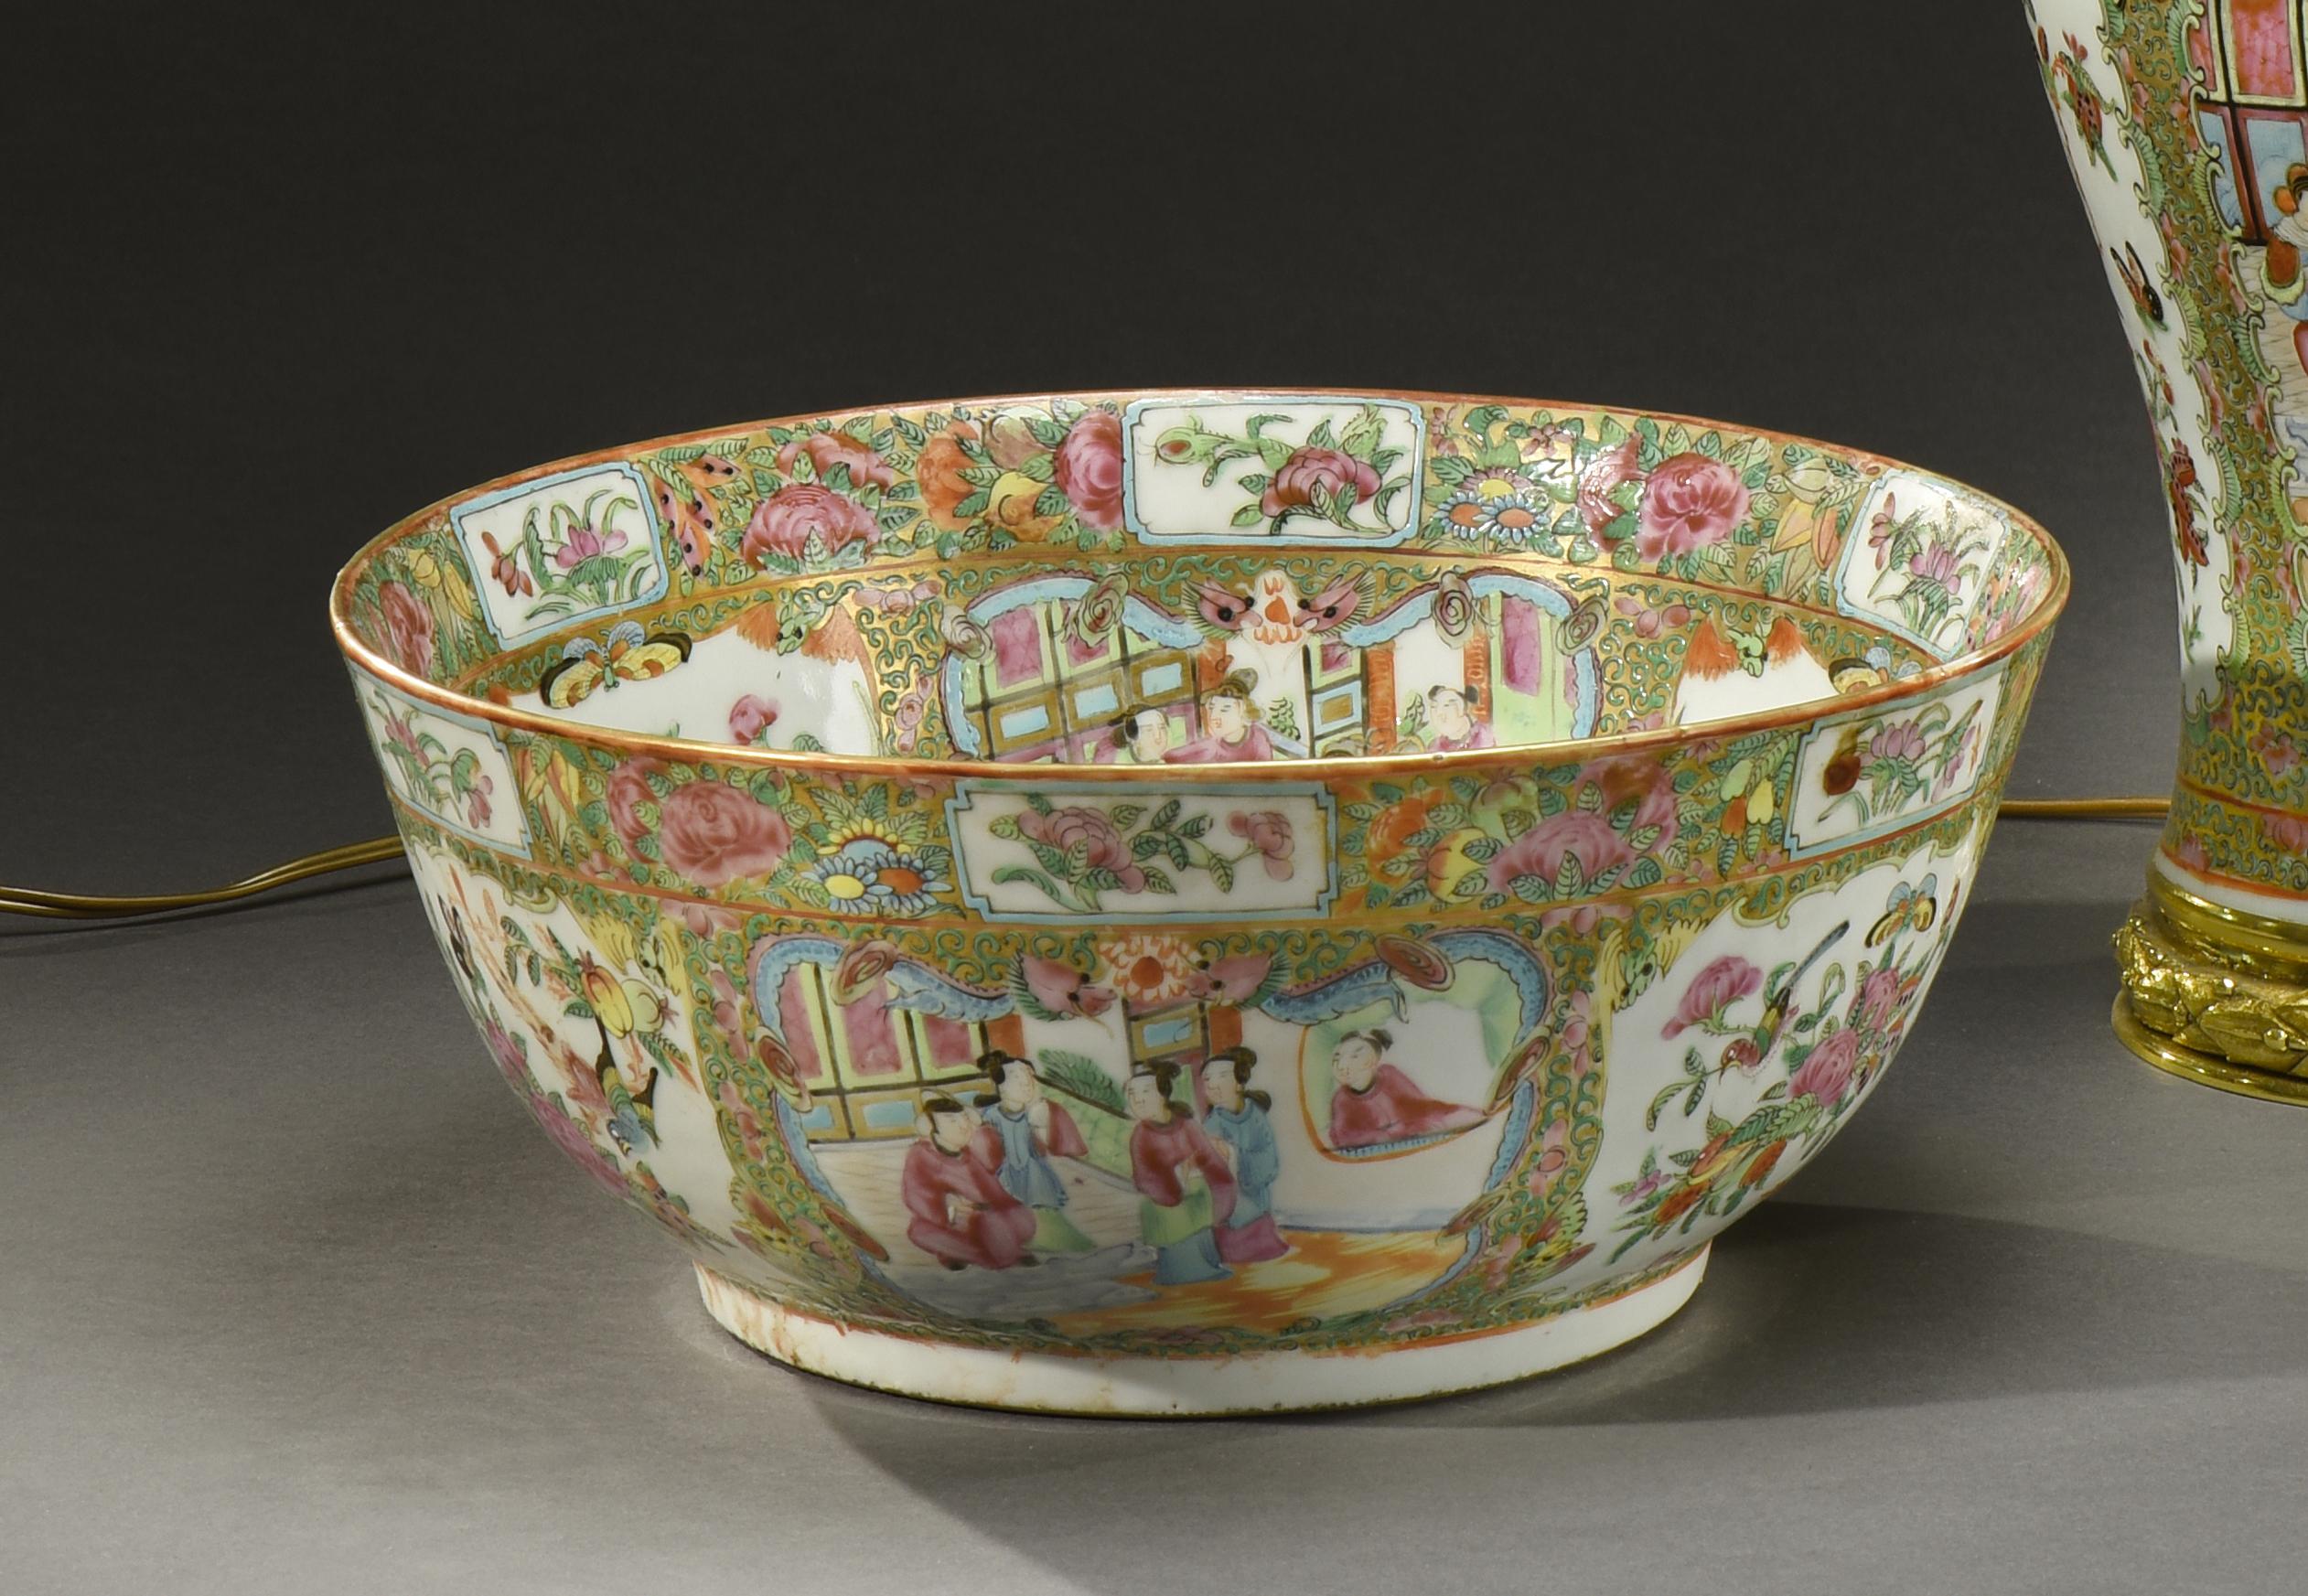 vasque en porcelaine Agrandir